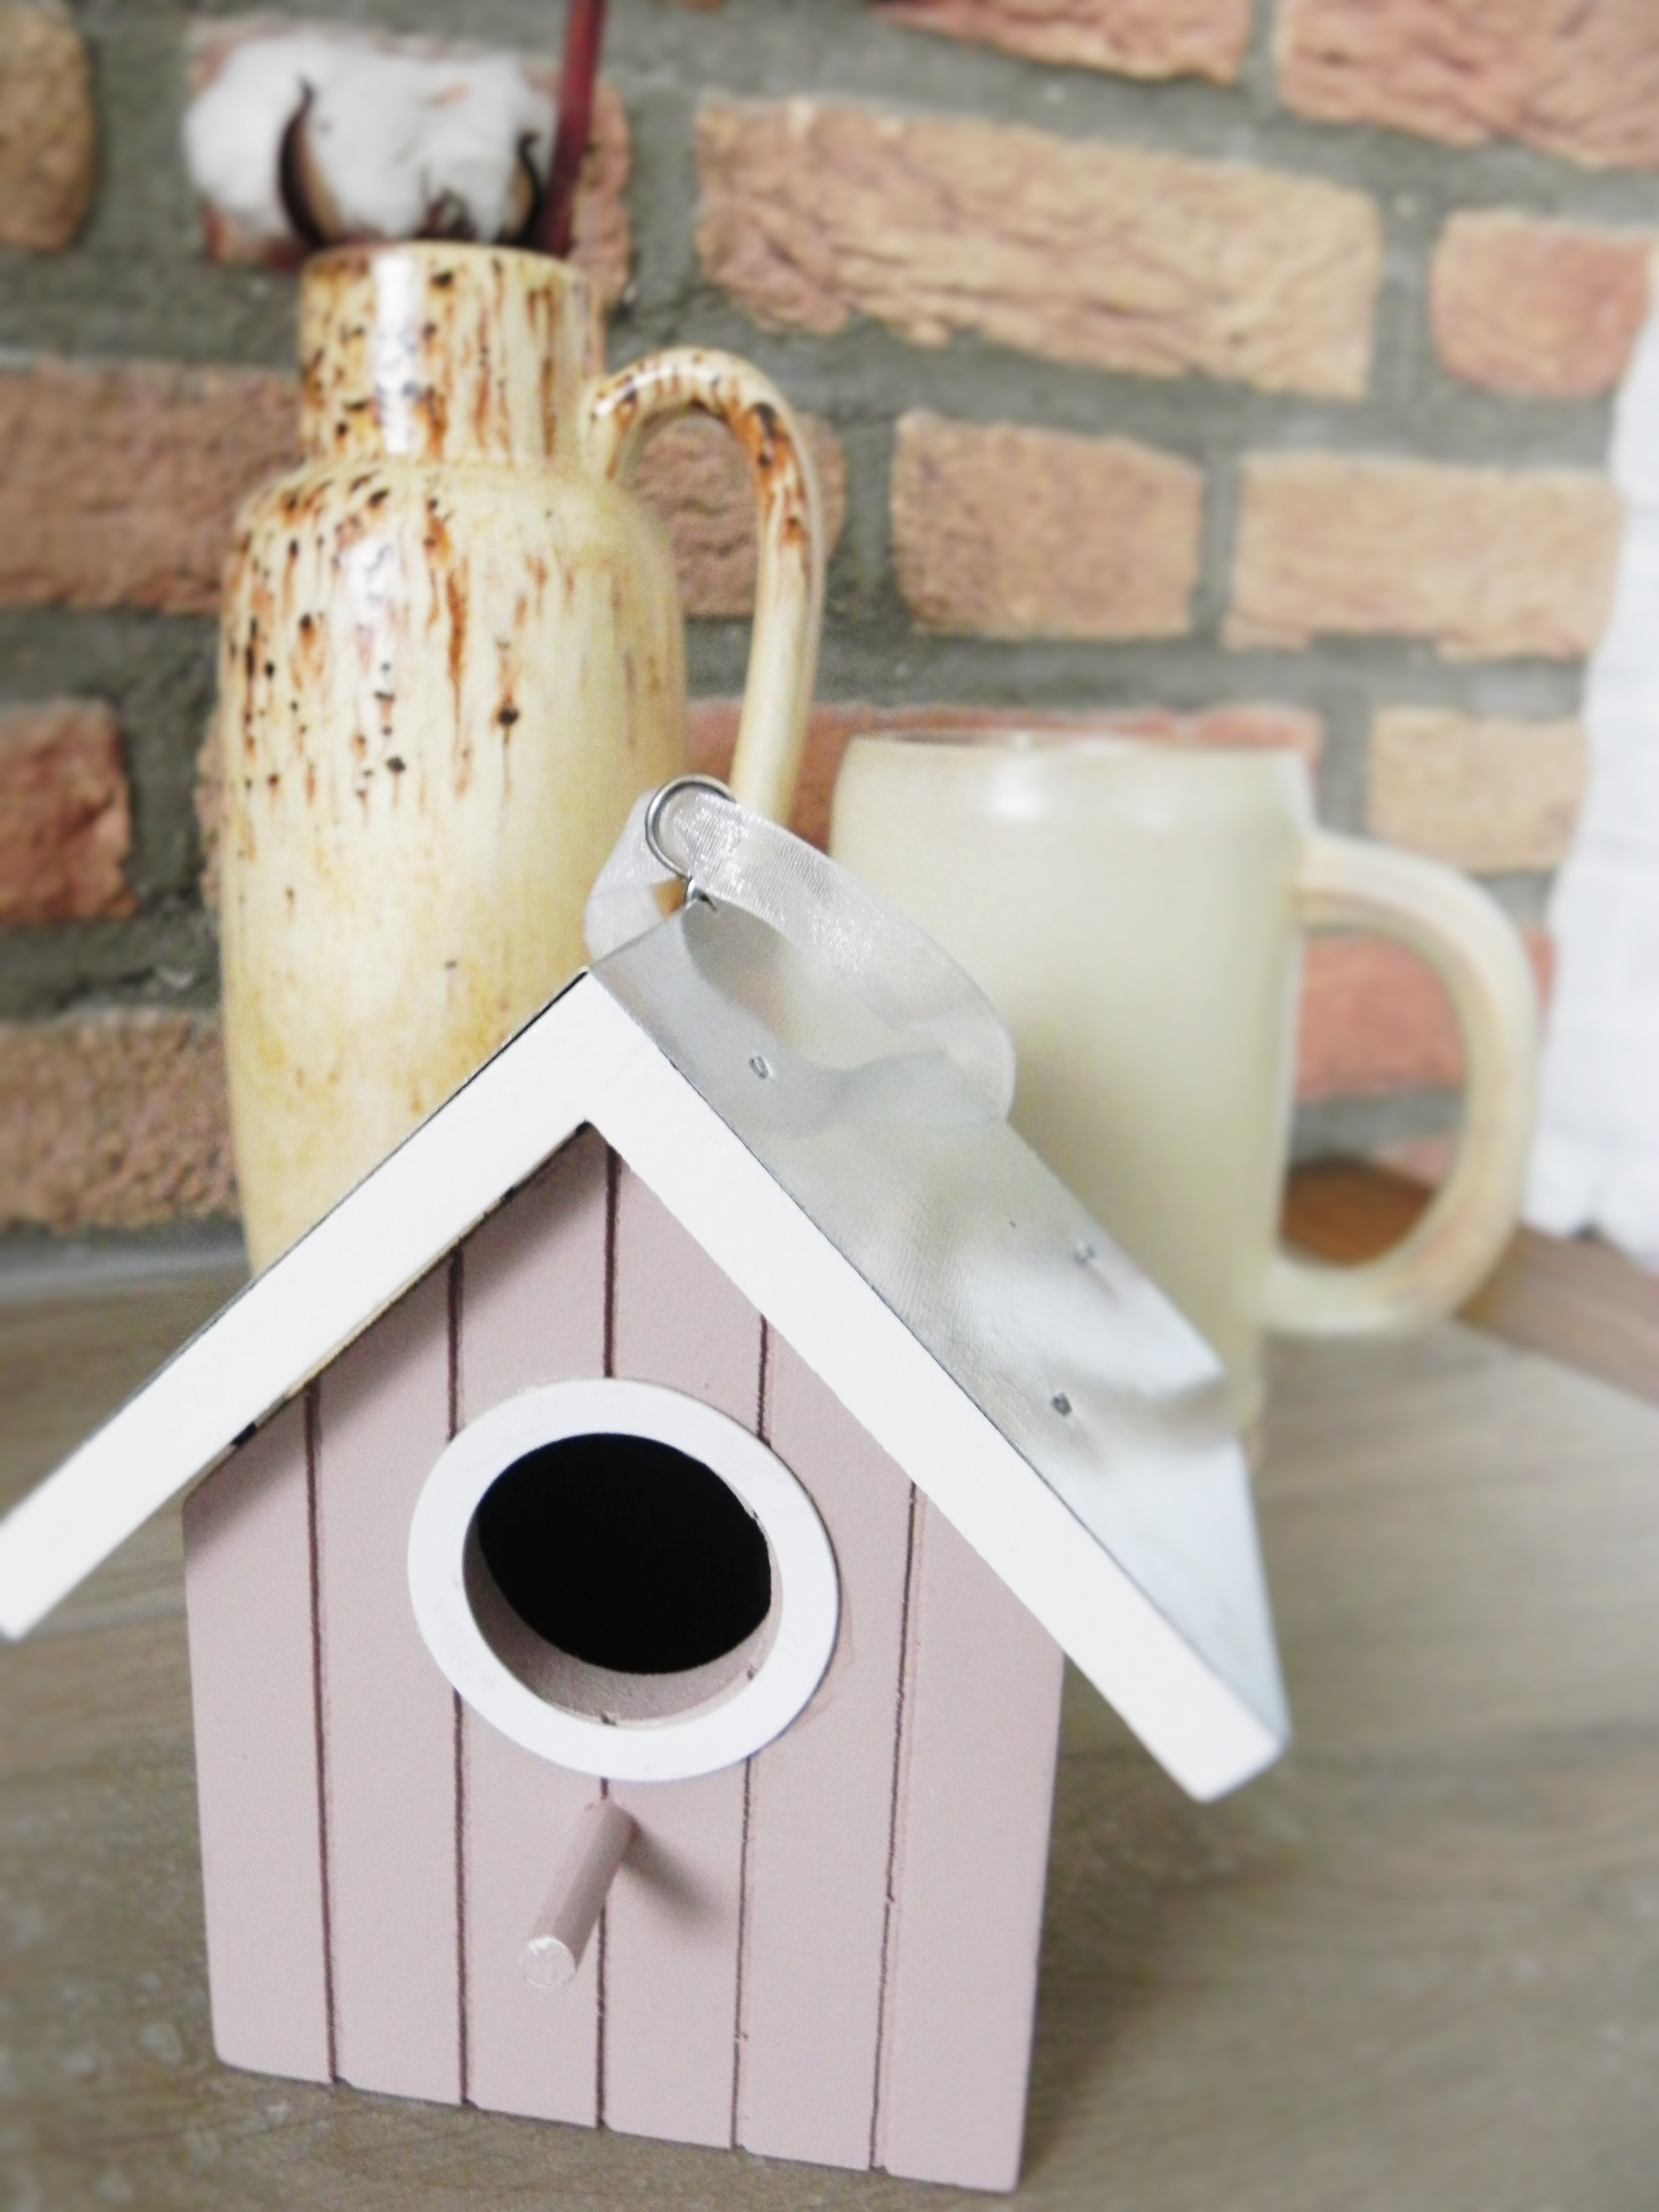 woonaccessoires, decoratie, interieur, huis, blog, huis stylen, lifestyleblog, La Log